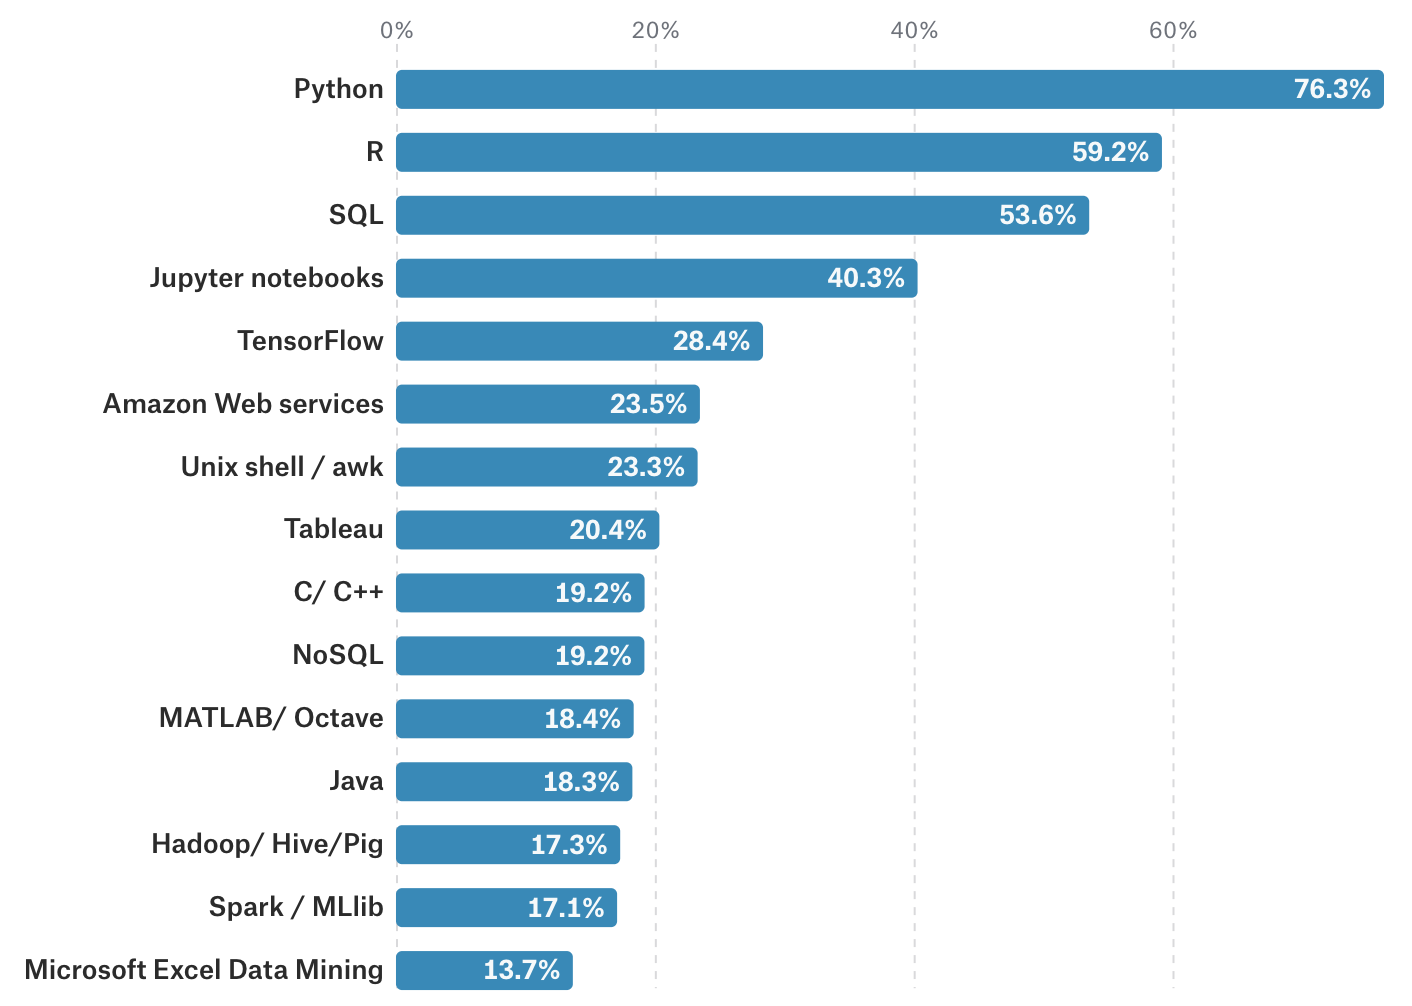 Popularity of Python vs R programming